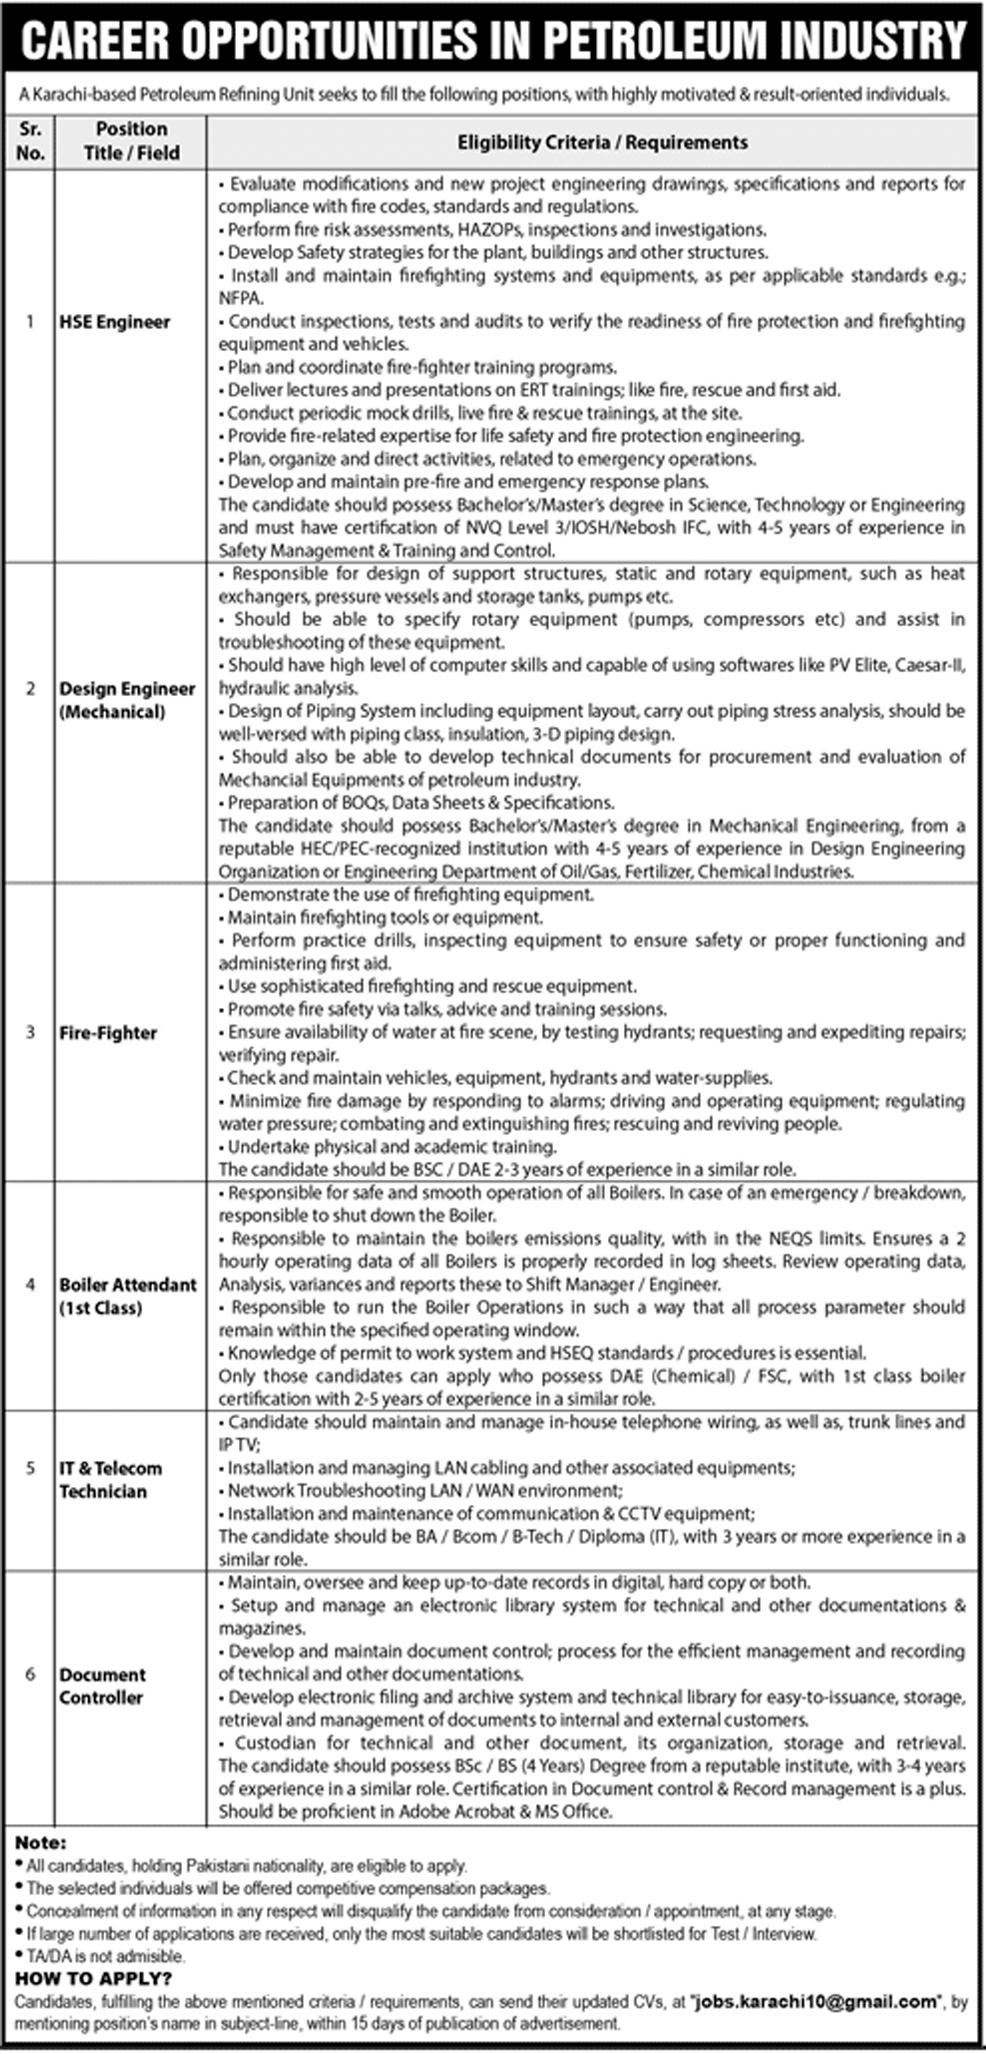 Public Sector Organization Karachi Jobs 11 Aug 2019